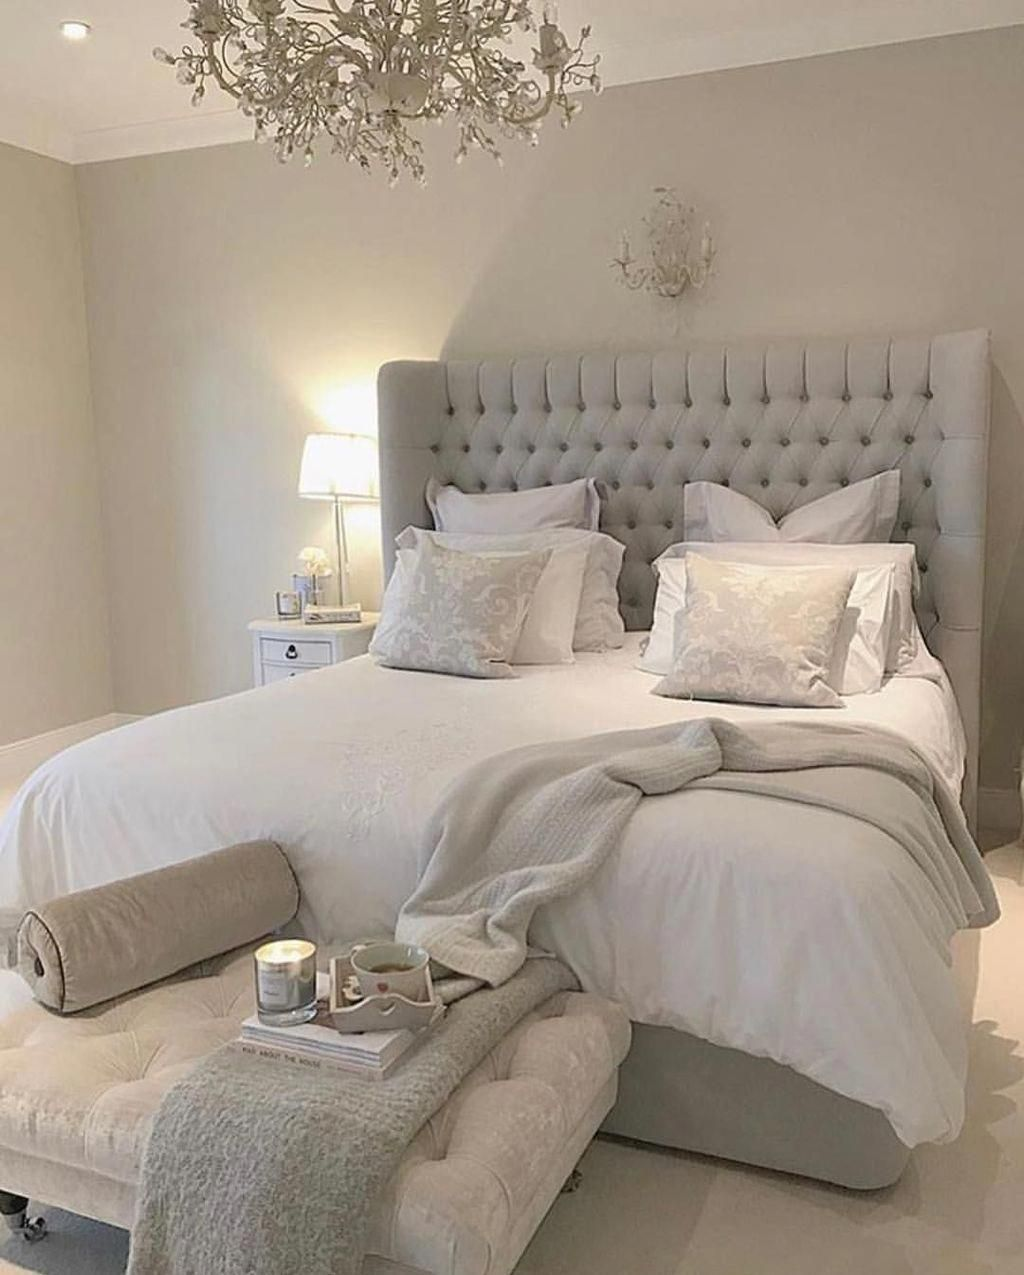 Best 48 The Best Master Bedroom Design Ideas To Refresh In 2020 640 x 480